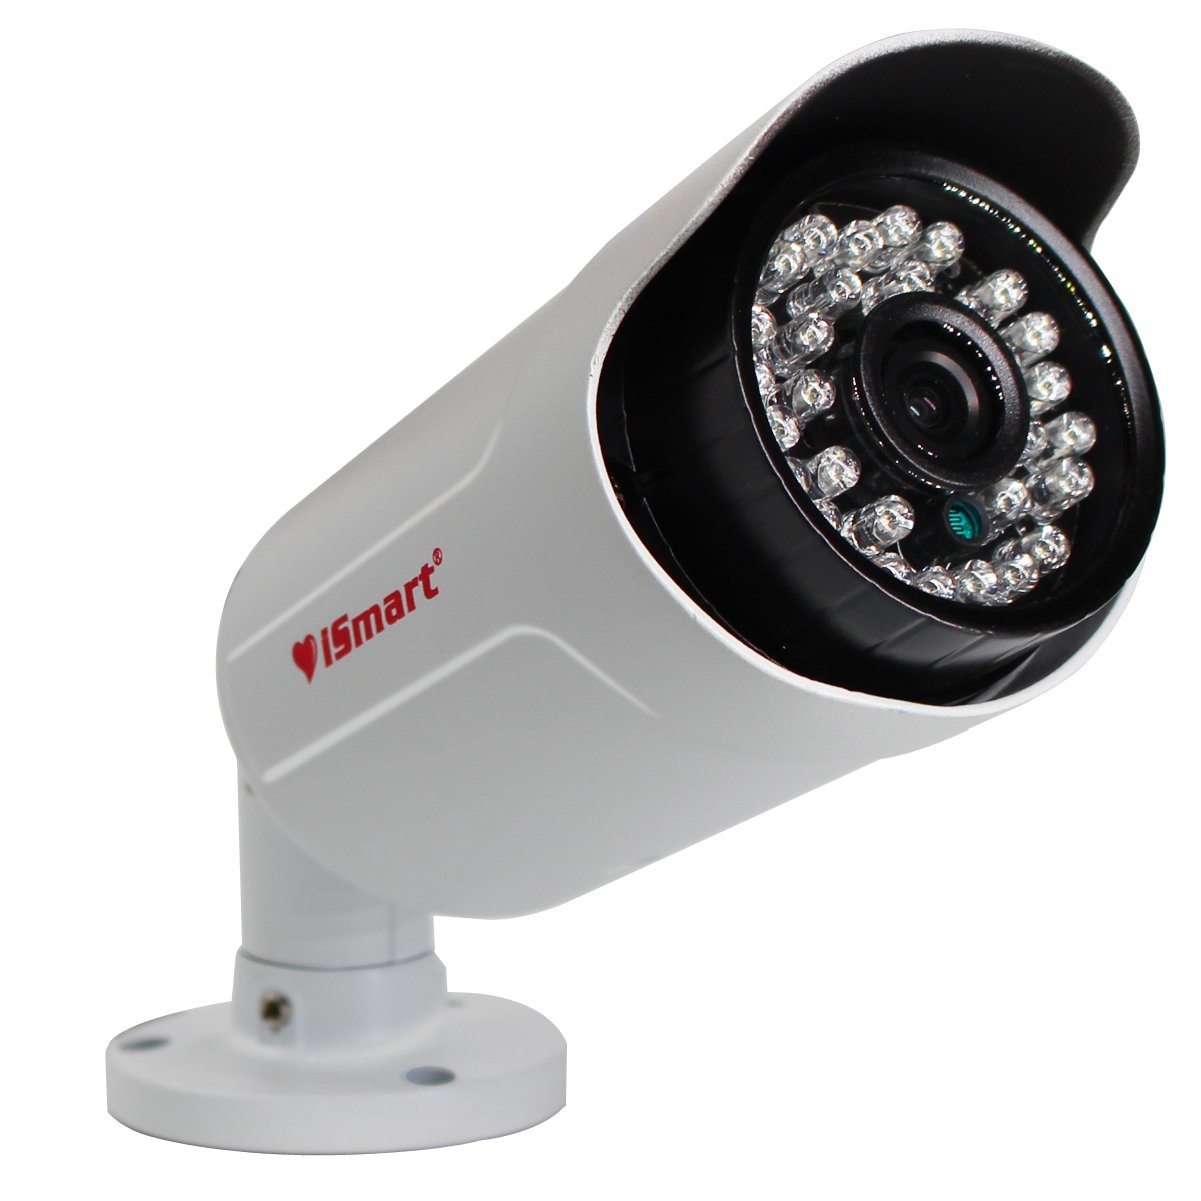 iSmart 960P 1280TVL CCTV AHD (Analog High Definition) Bullet Camera Security System with 30pcs IR LEDs C1066AH3